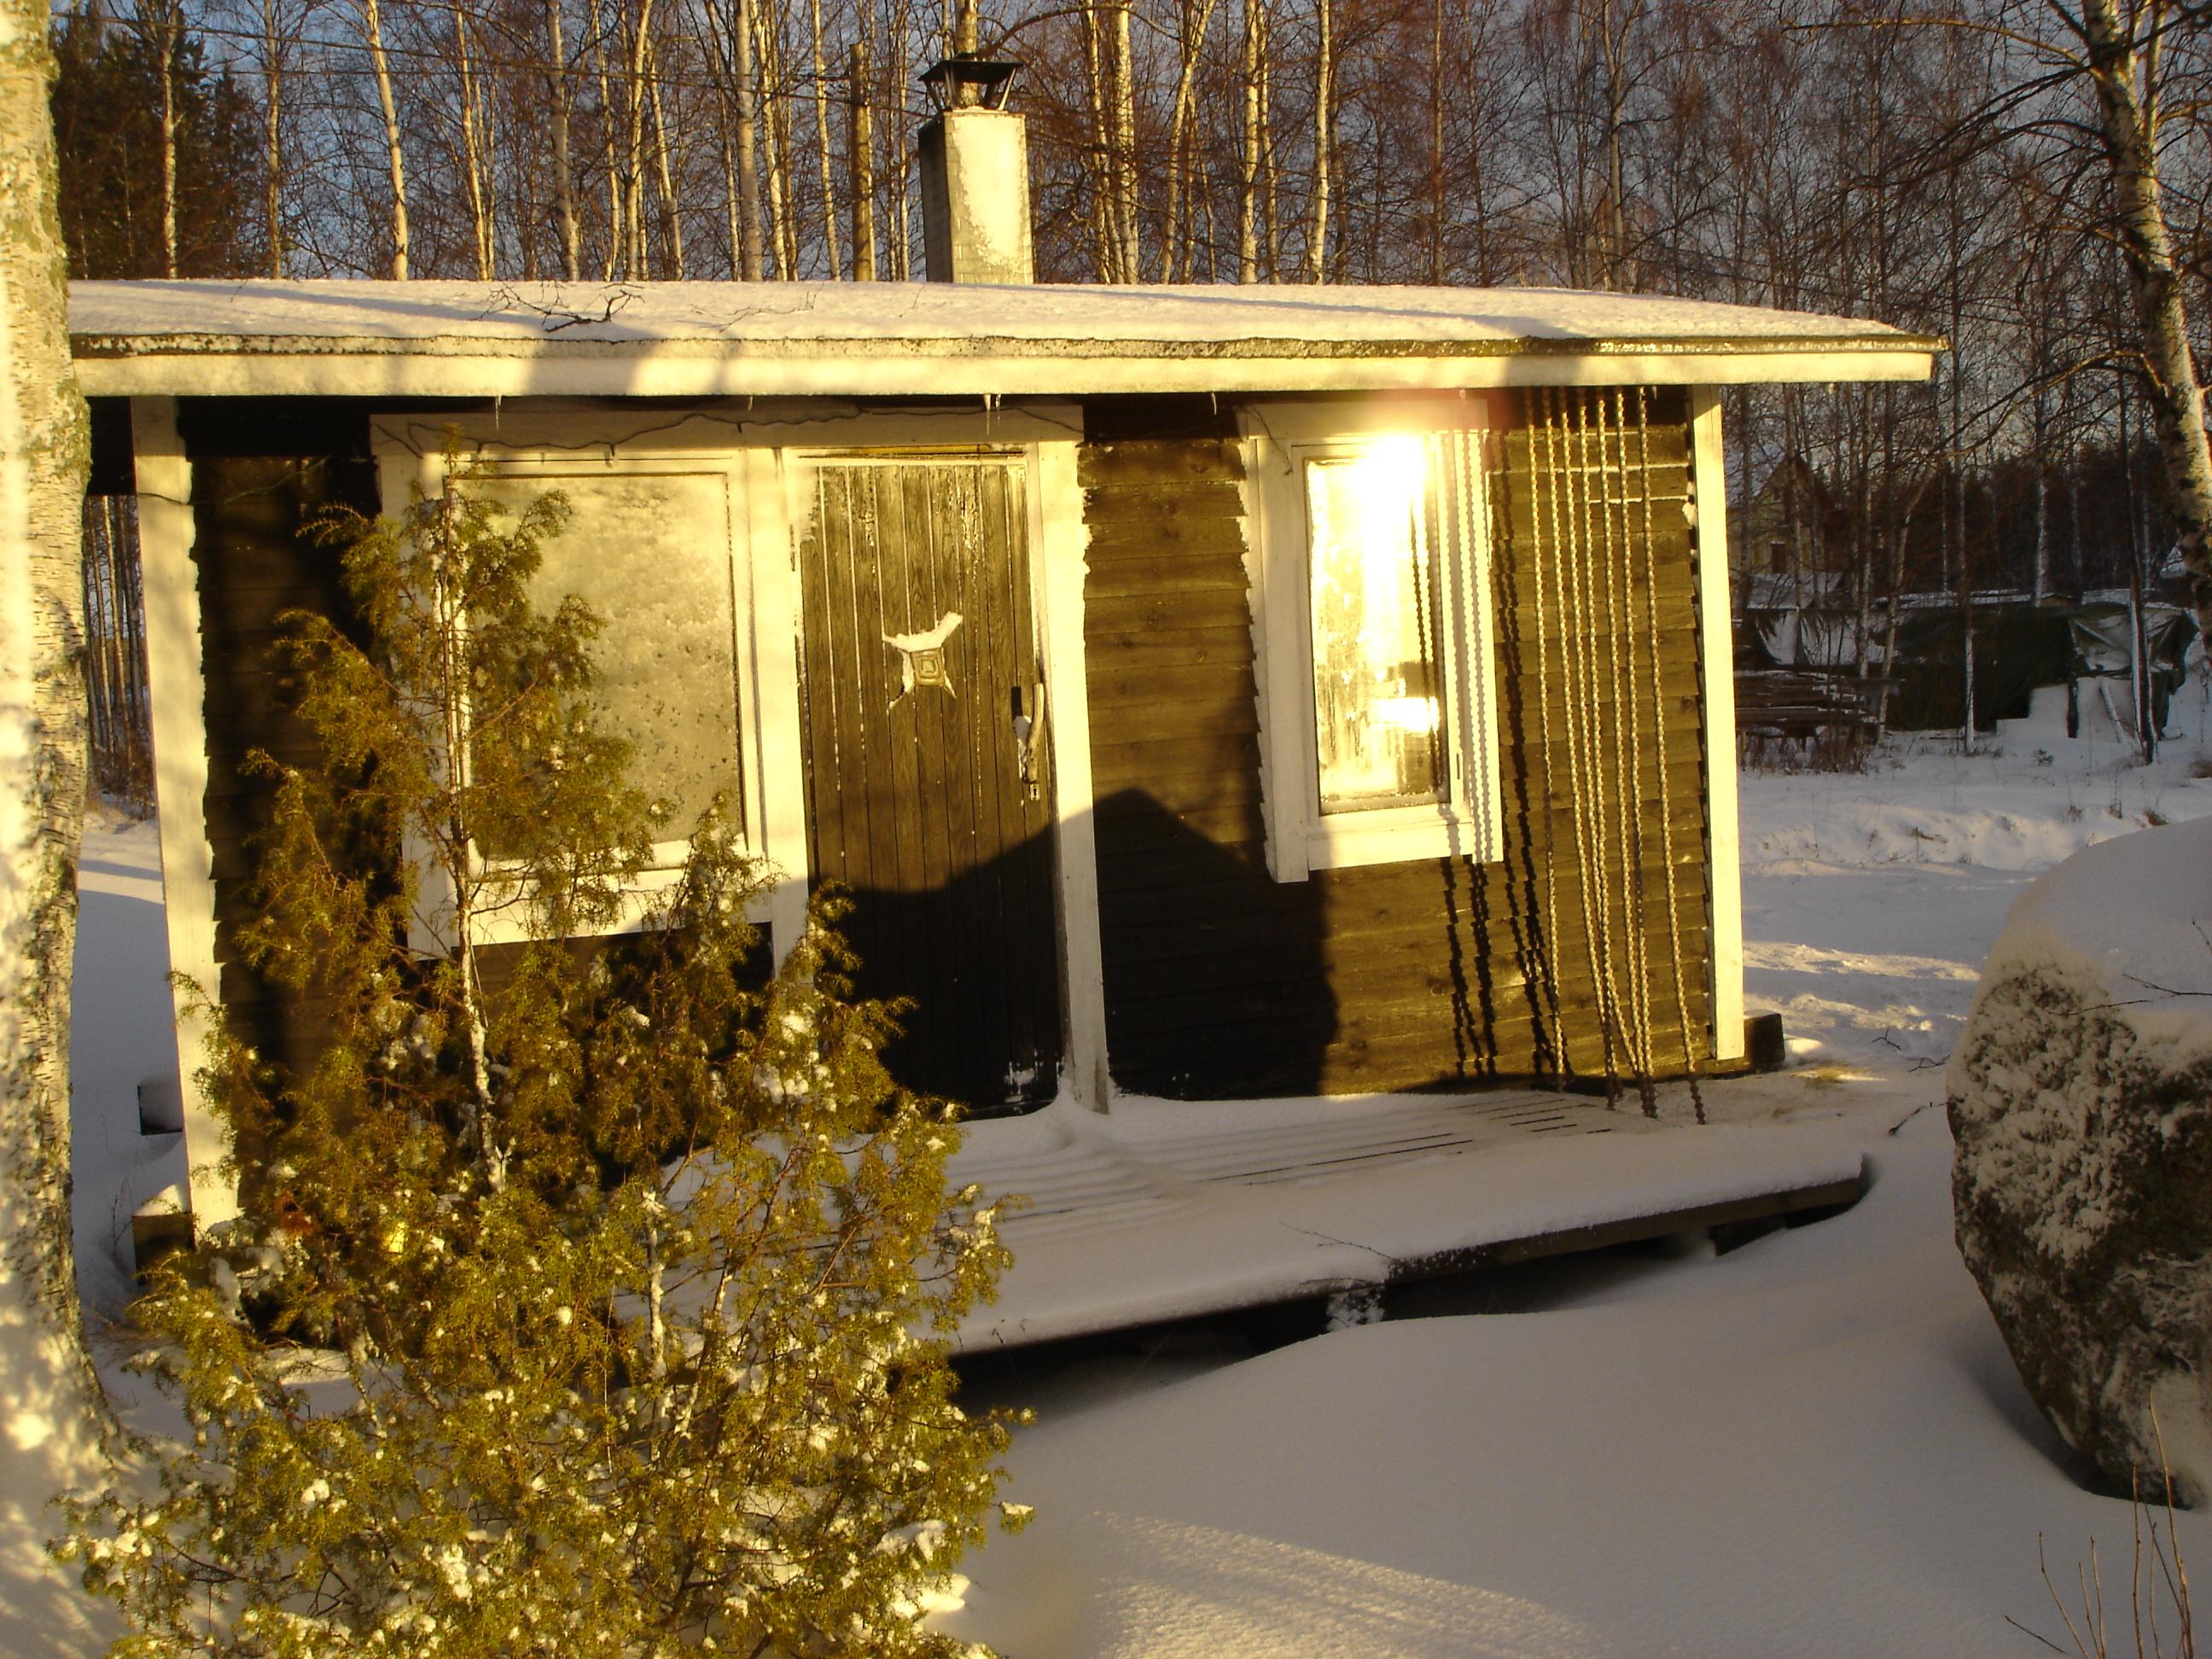 svenska amatör sex stockholm sauna